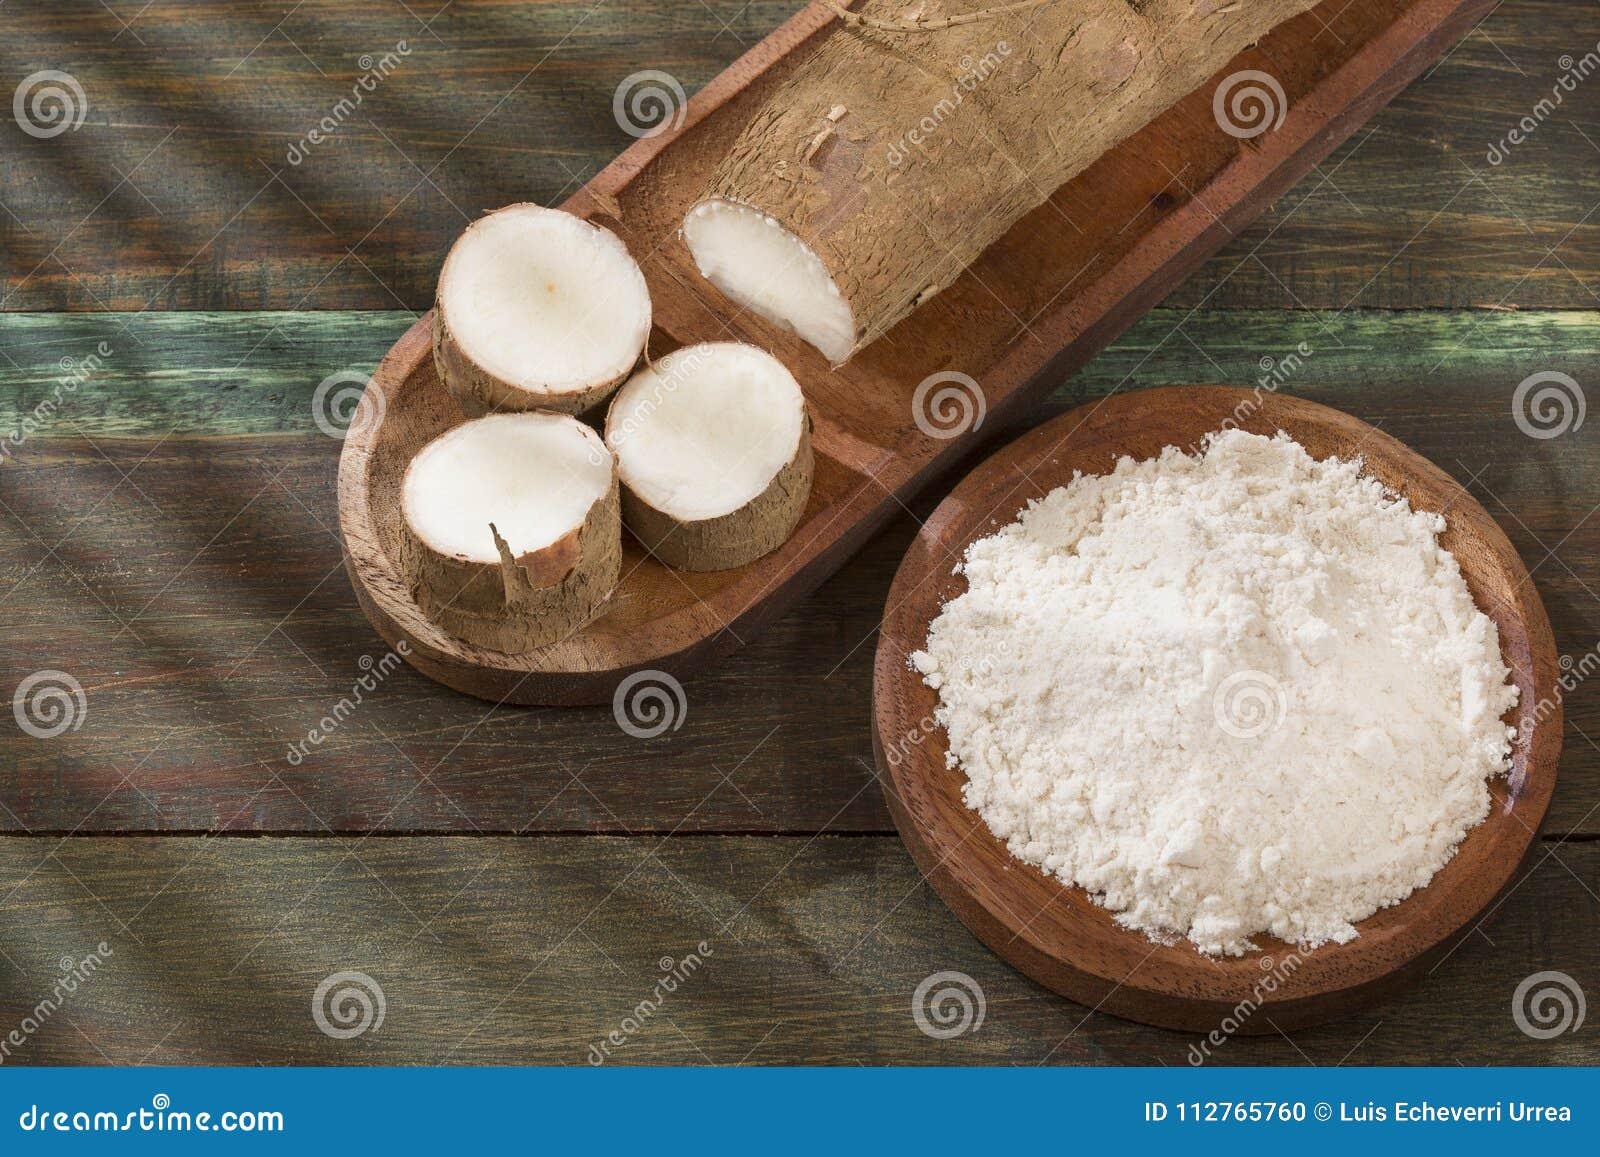 Maniokastärke - Manihot essbar